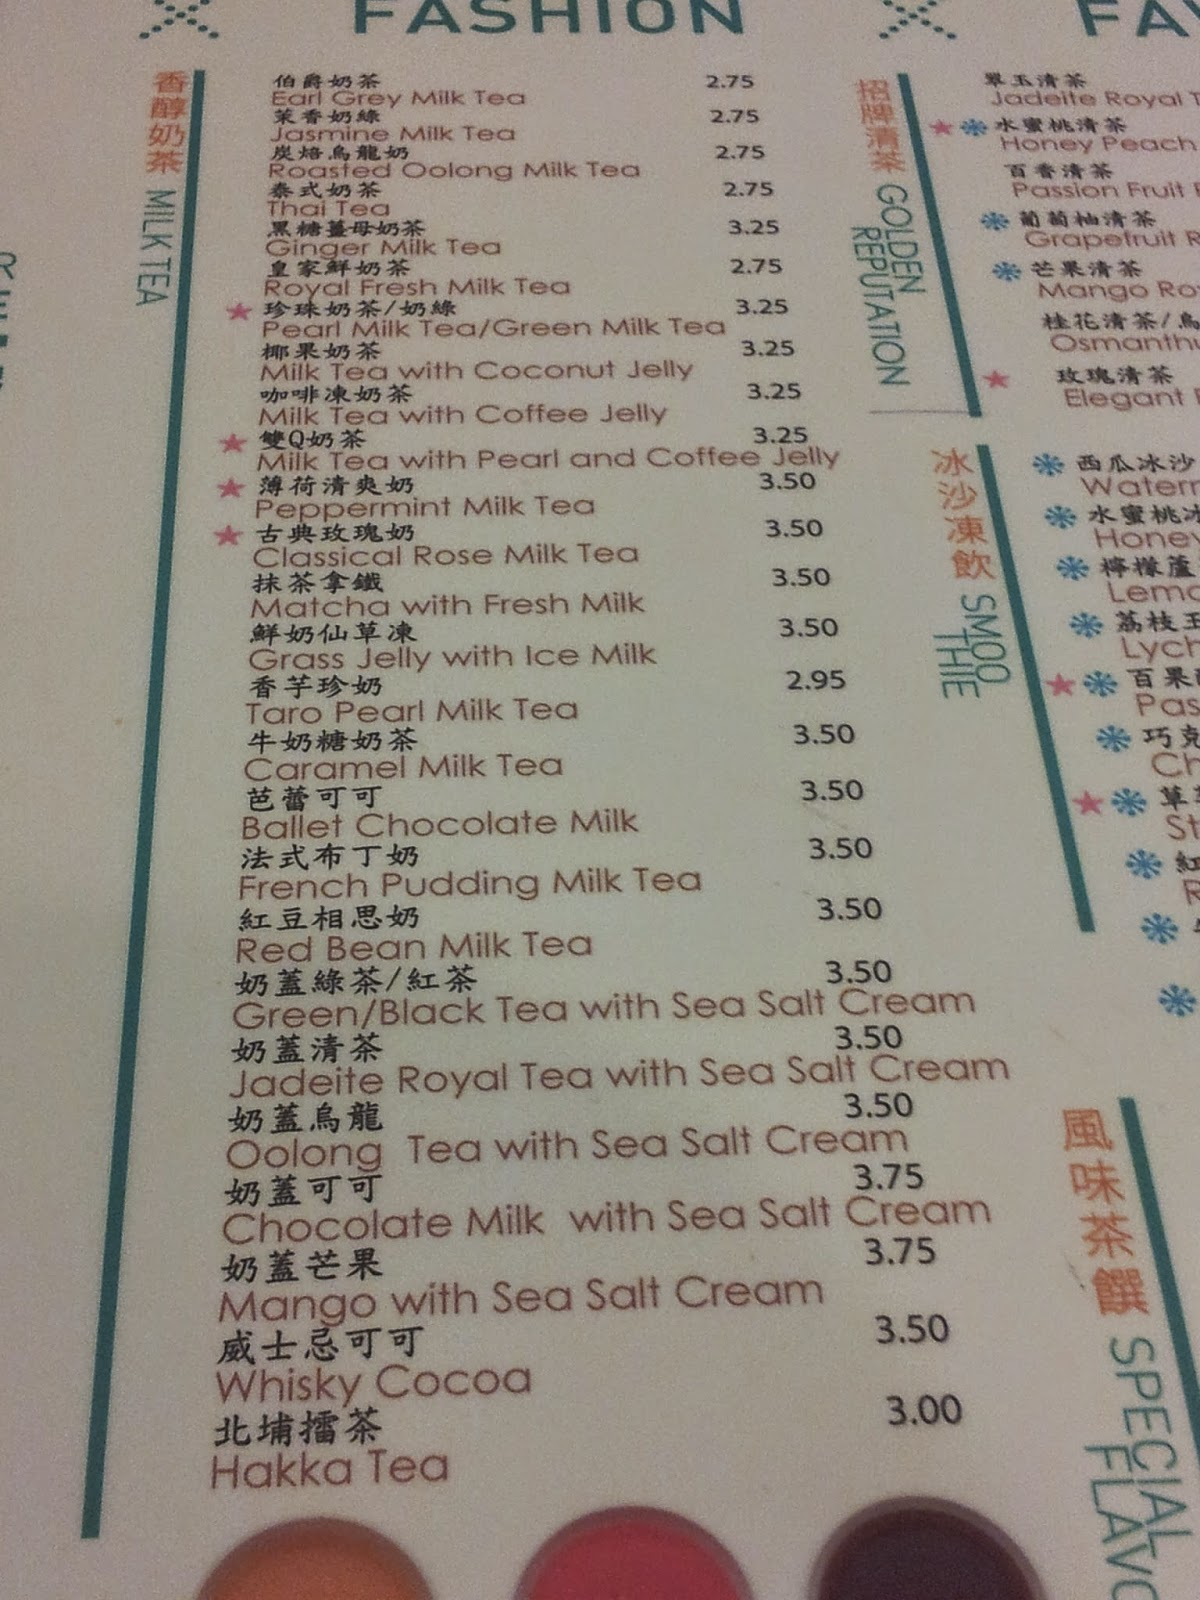 list menu ice Shaved flavor